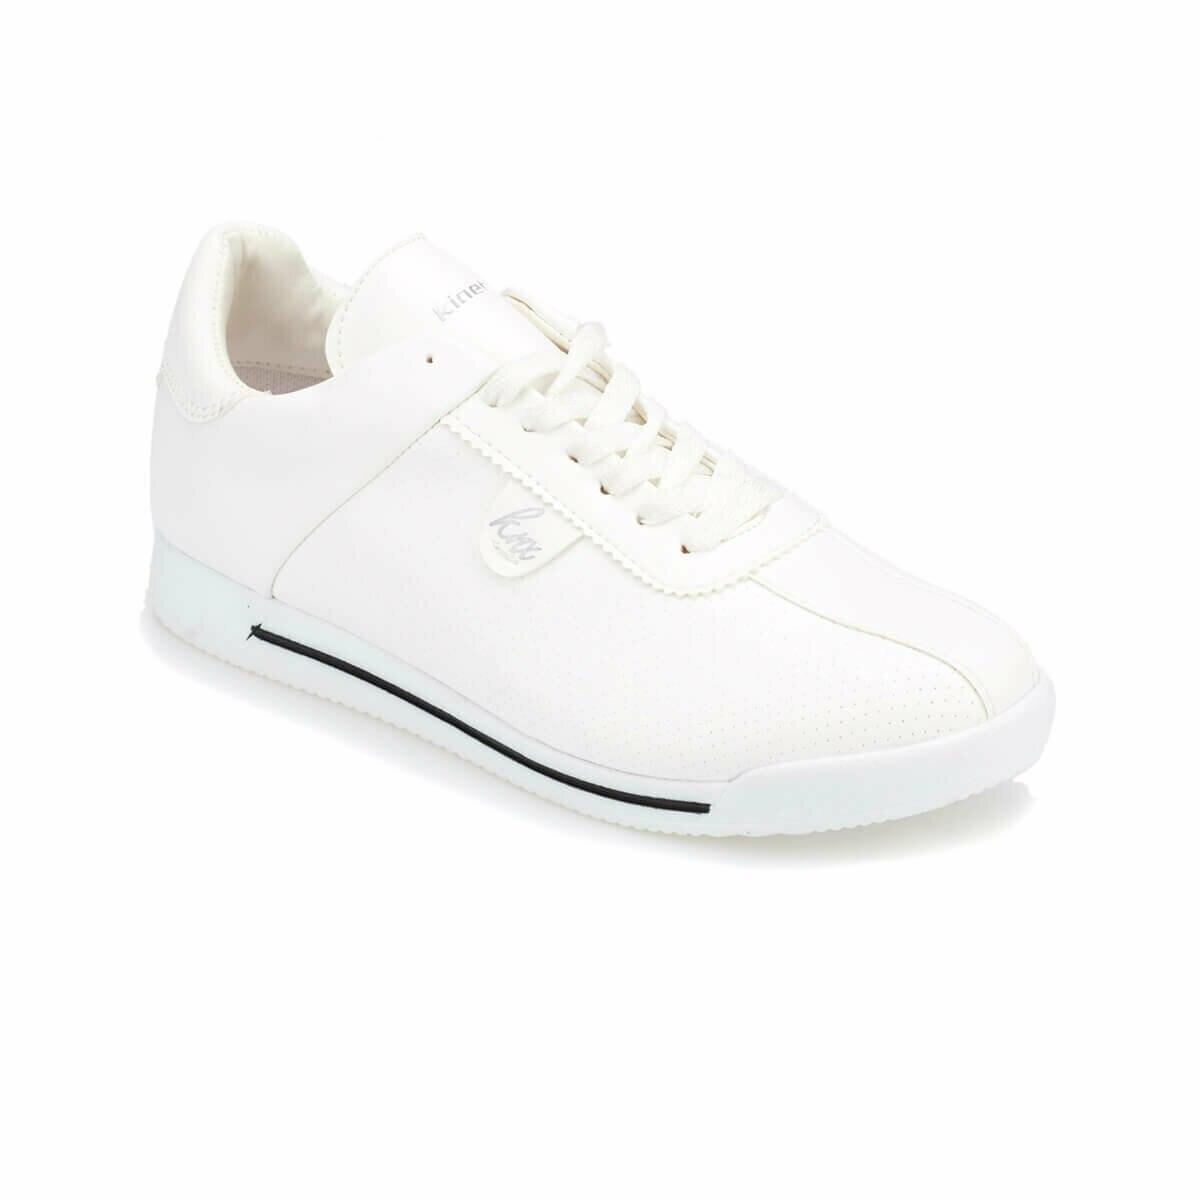 FLO TARES White Women 'S Sneaker Shoes KINETIX